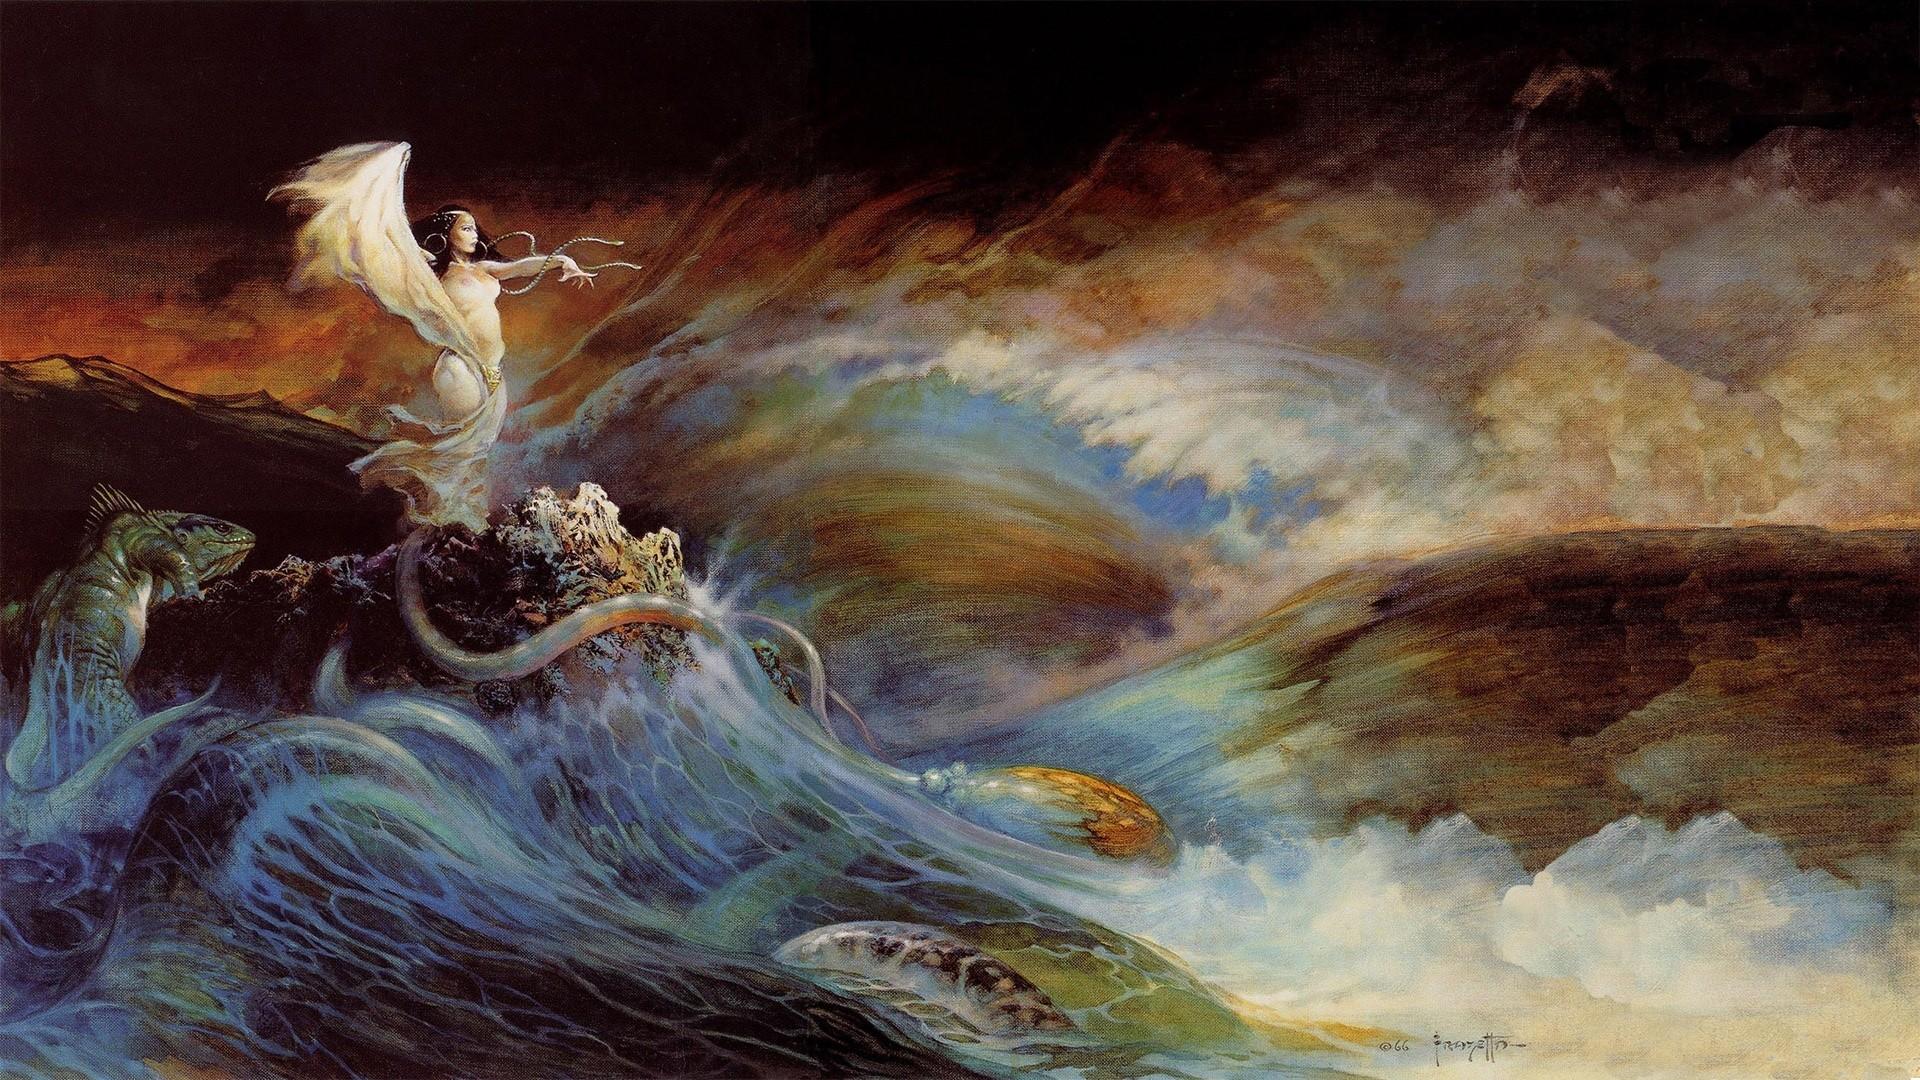 Wallpaper  Painting, Sea Monsters, Fantasy Art, Fantasy Girl, Artwork, Waves -6010